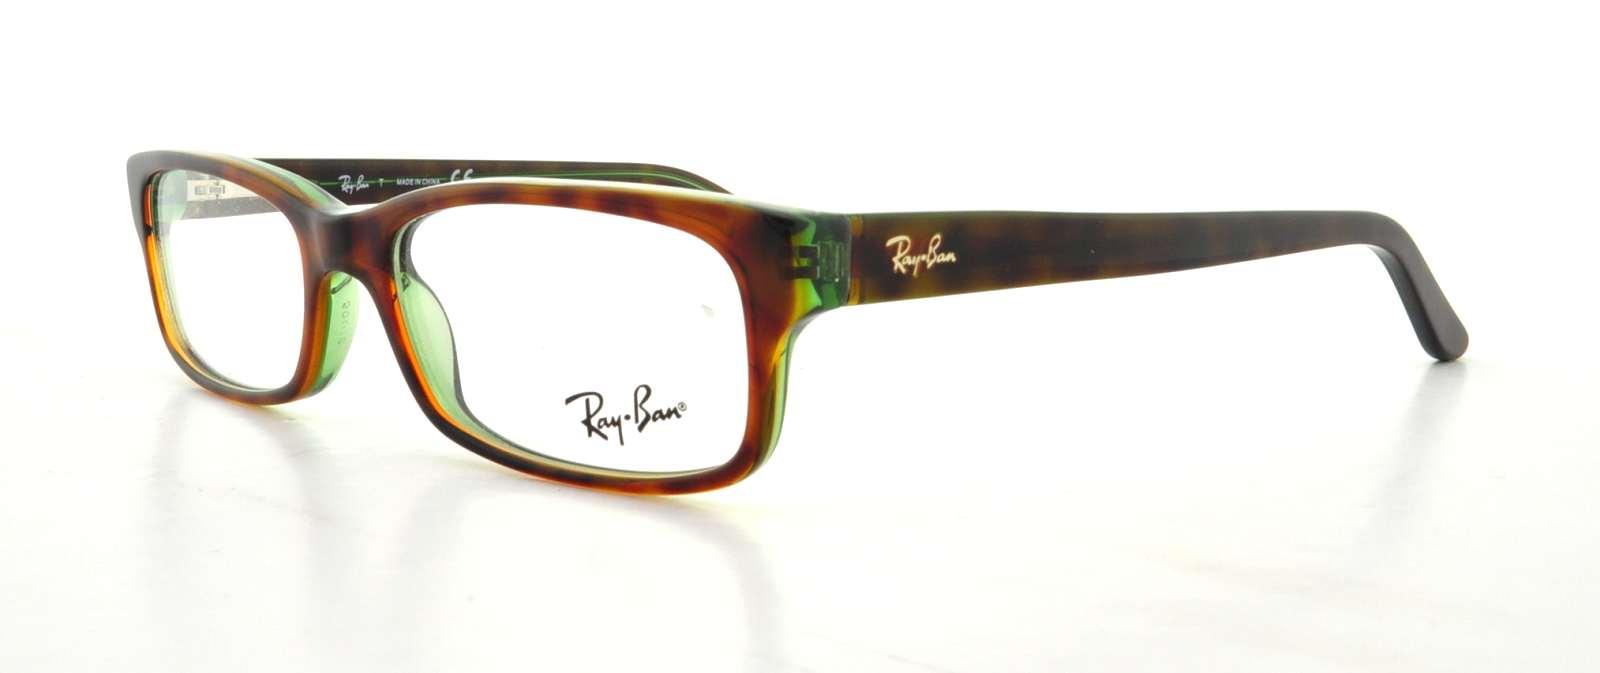 17c88917a0 Designer Frames Outlet. Ray Ban RX5187